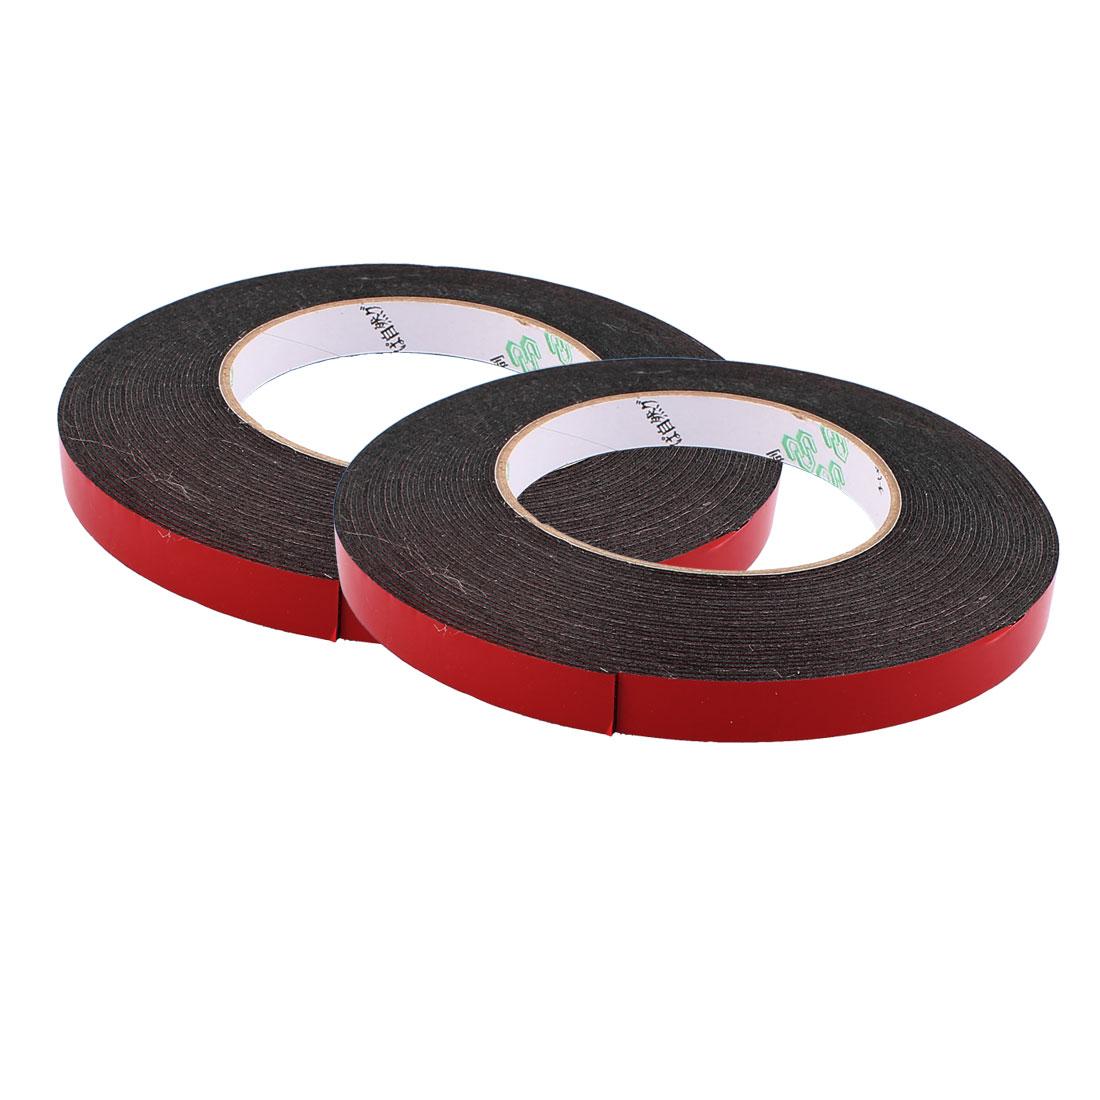 2 Pcs 1.2CM Width 10M Length 1MM Thick Dual Sided Sealing Shockproof Sponge Tape